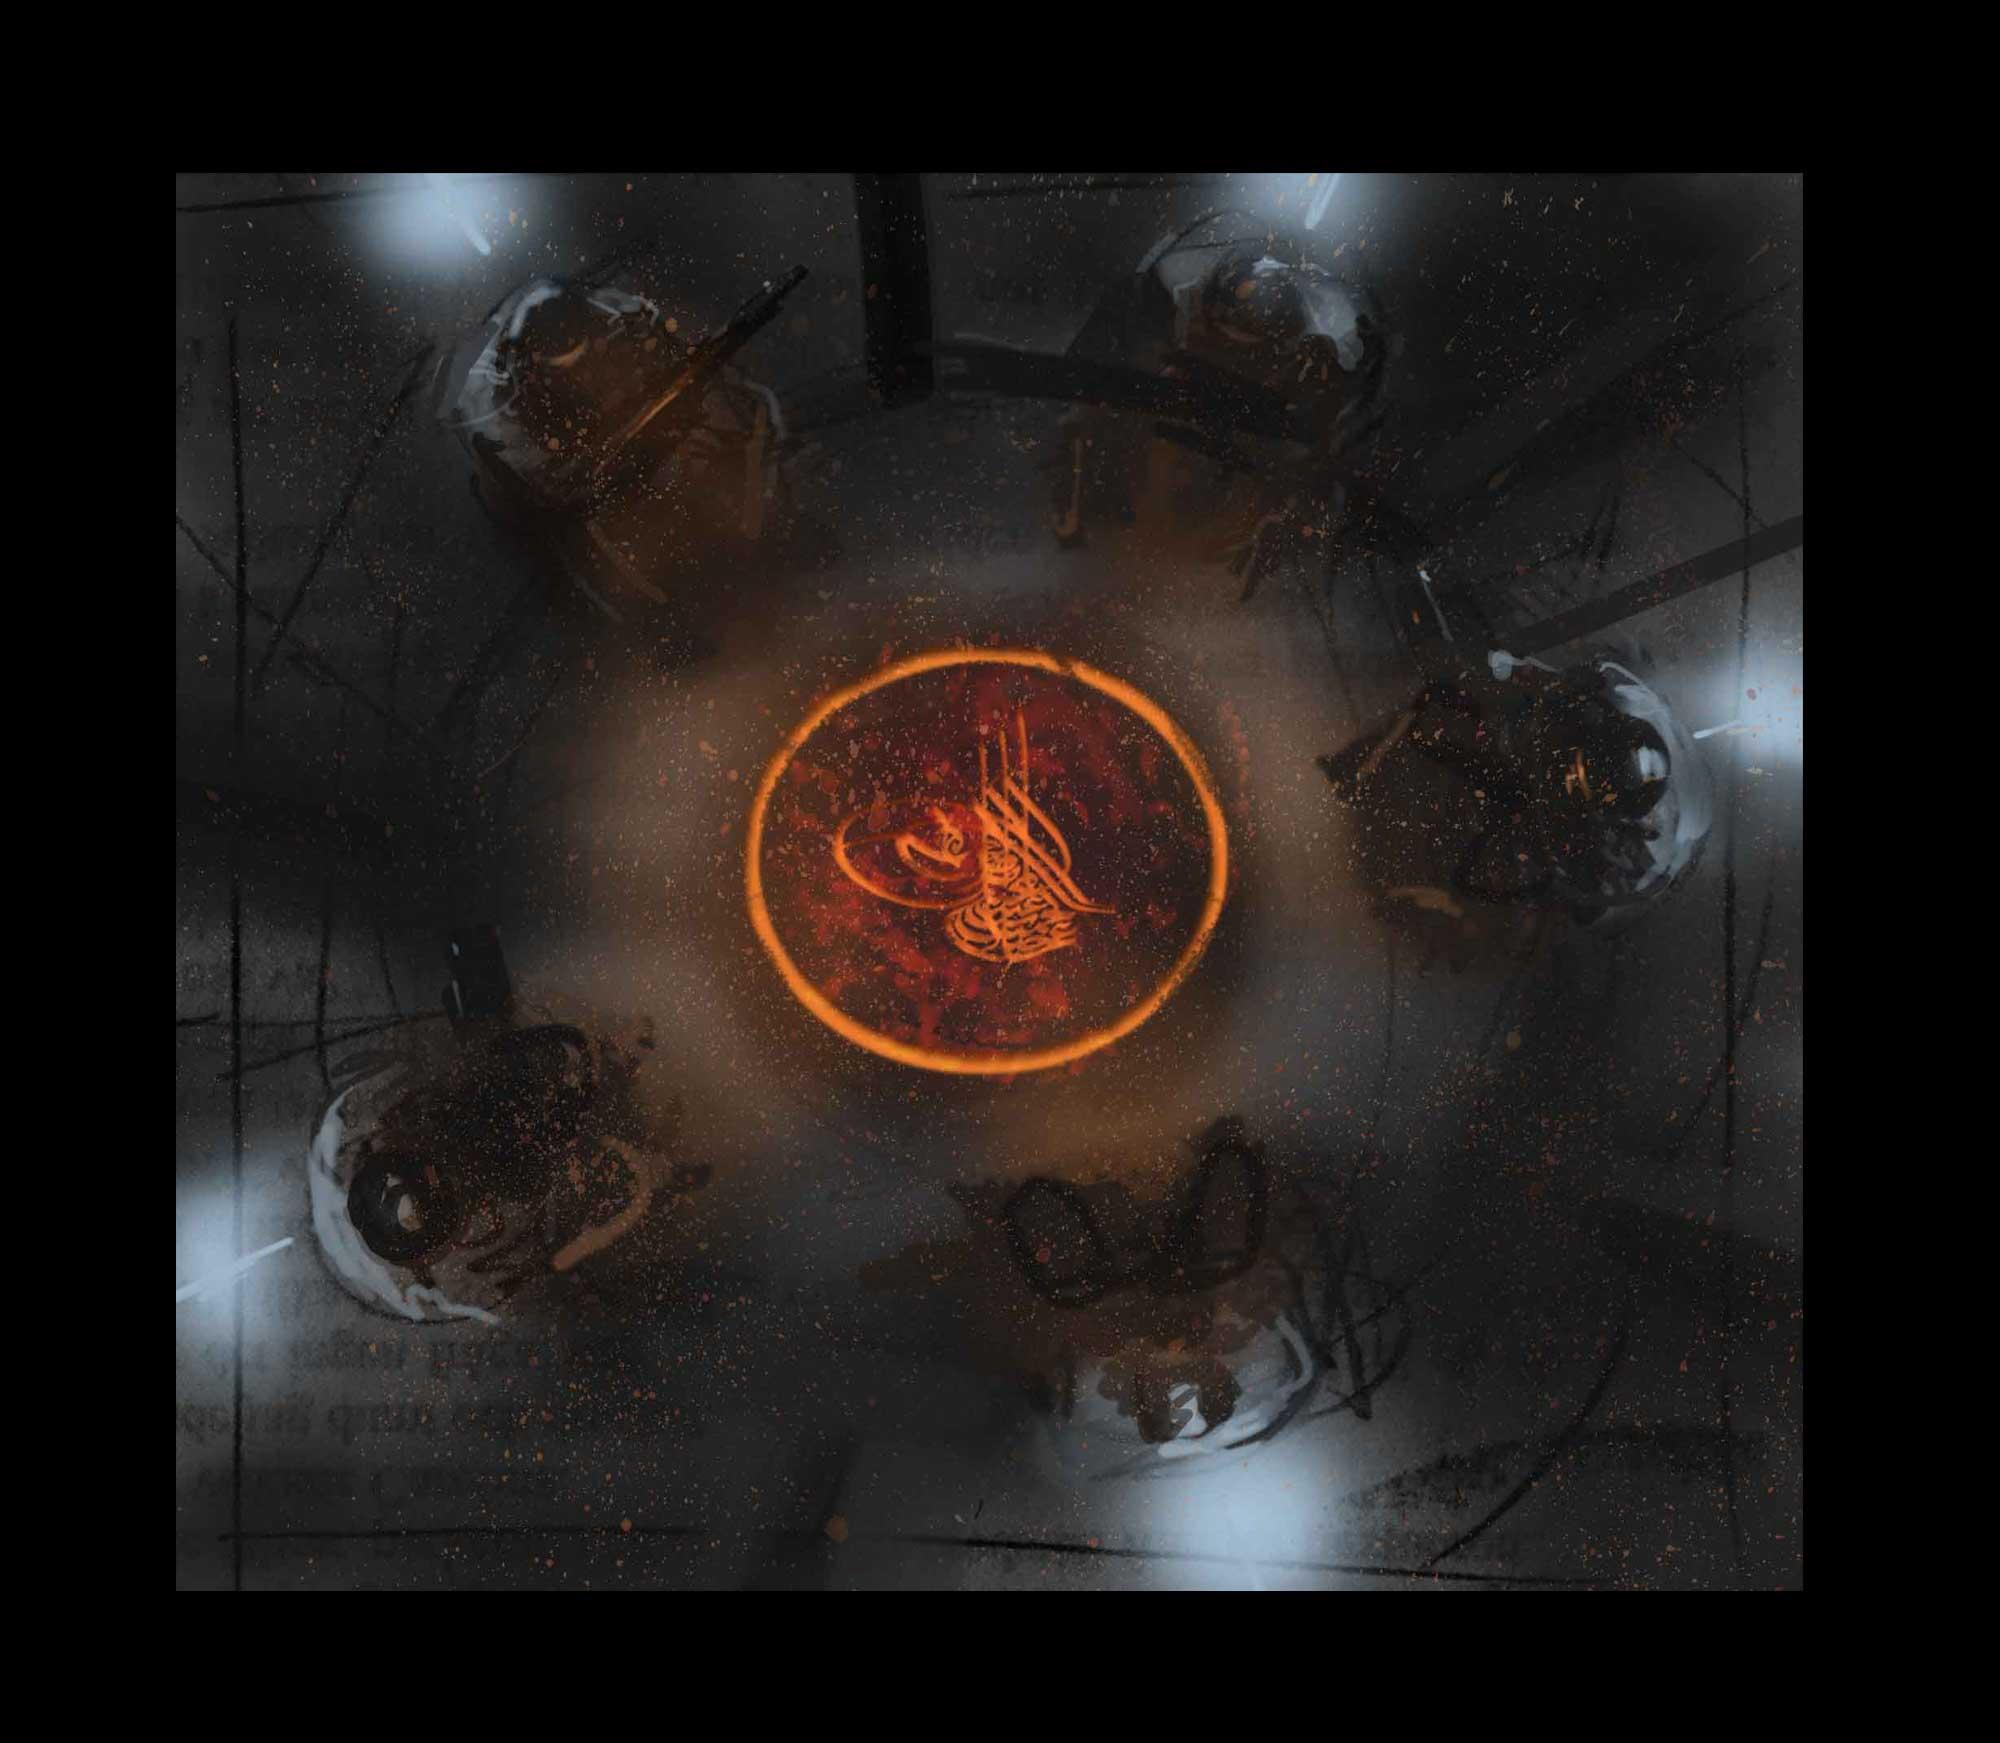 Coriolis - The Third Horizon: Guys (Image: Fria Ligan / Free League Publishing)